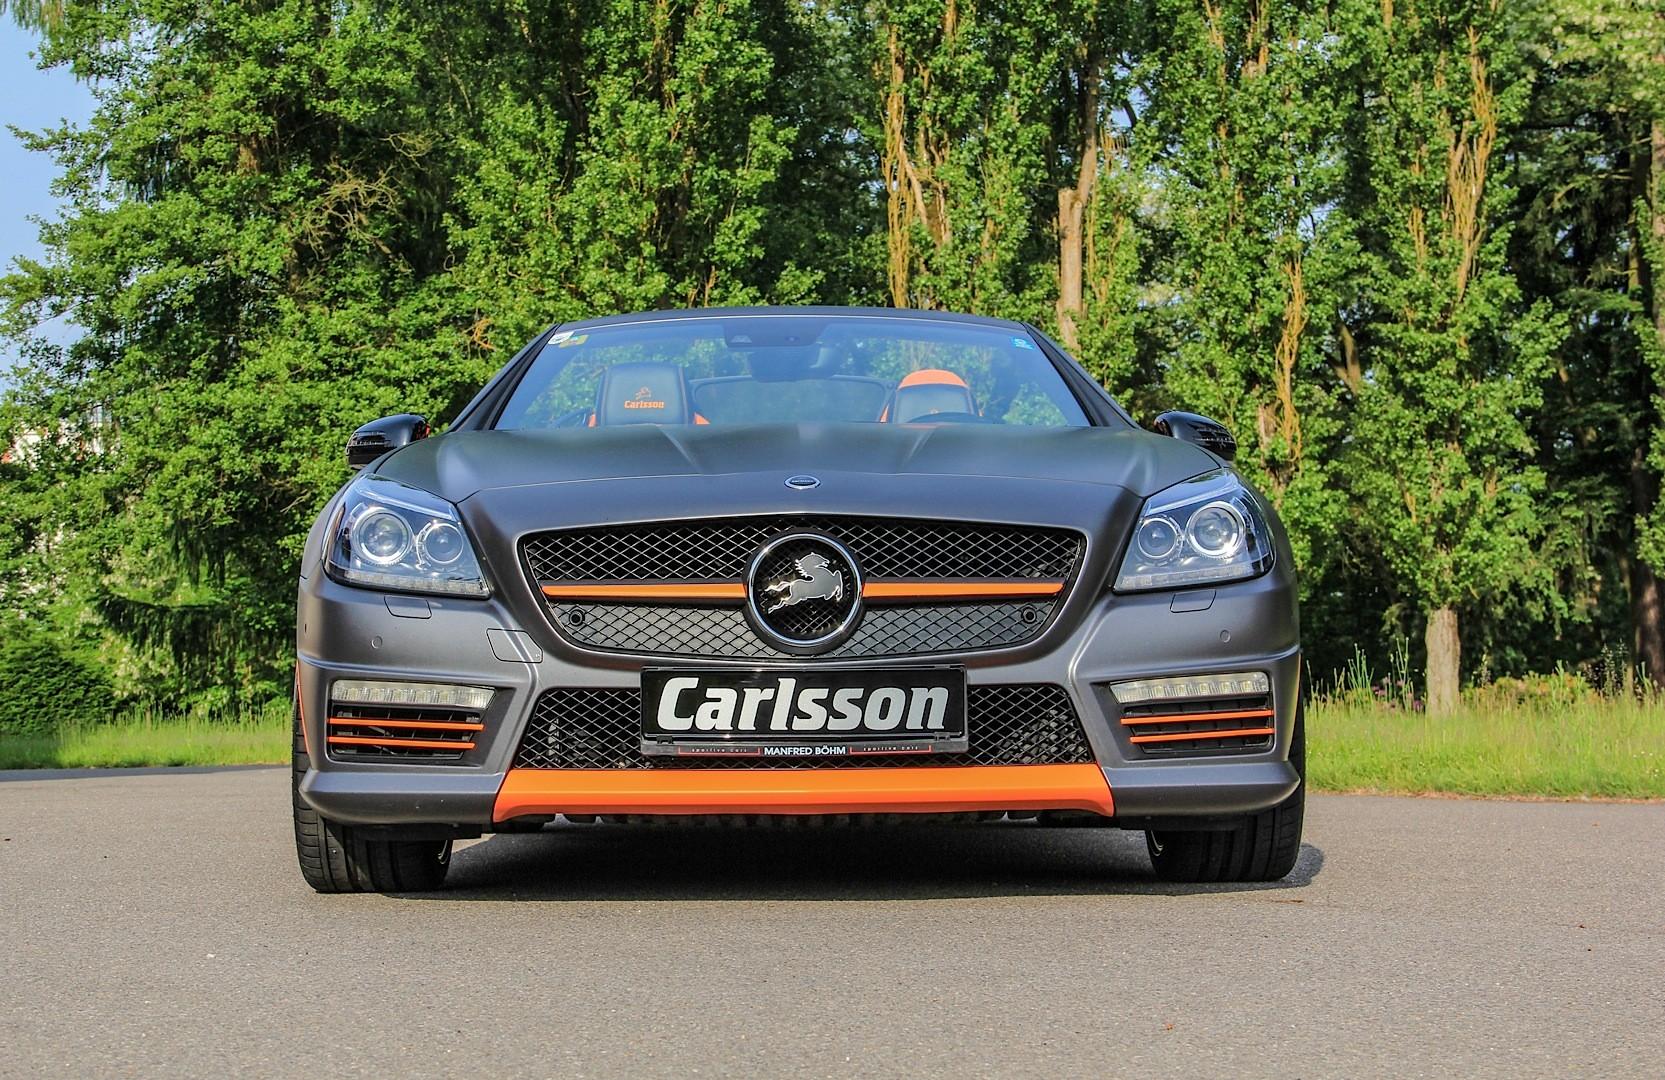 Mercedes slk 55 amg gets carlsson interior with orange and for Mercedes benz slk 55 amg special edition